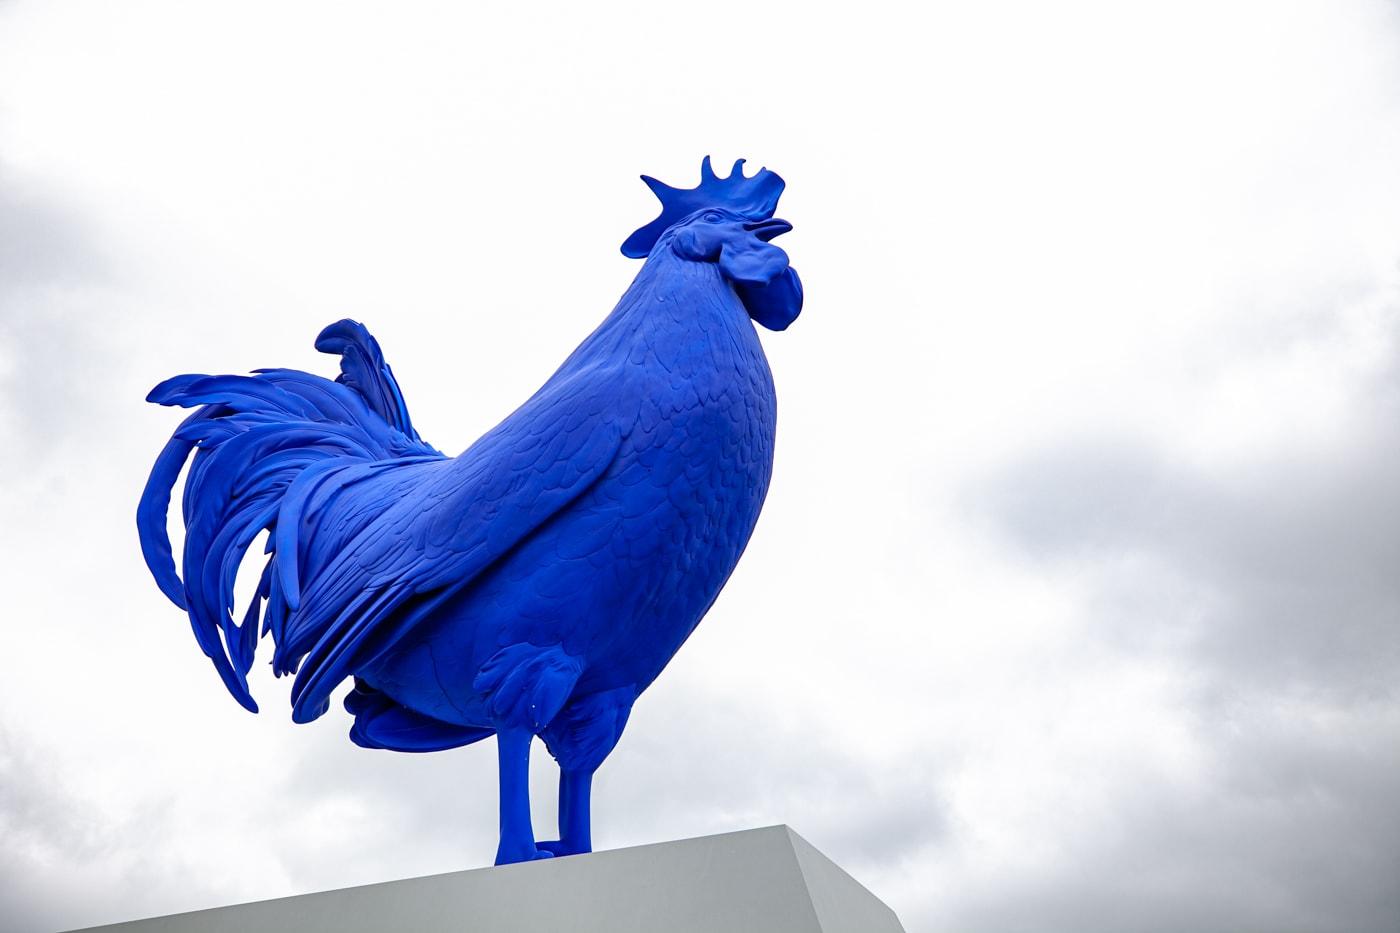 Hahn/Cock - big blue rooster at Minneapolis Sculpture Garden in Minnesota